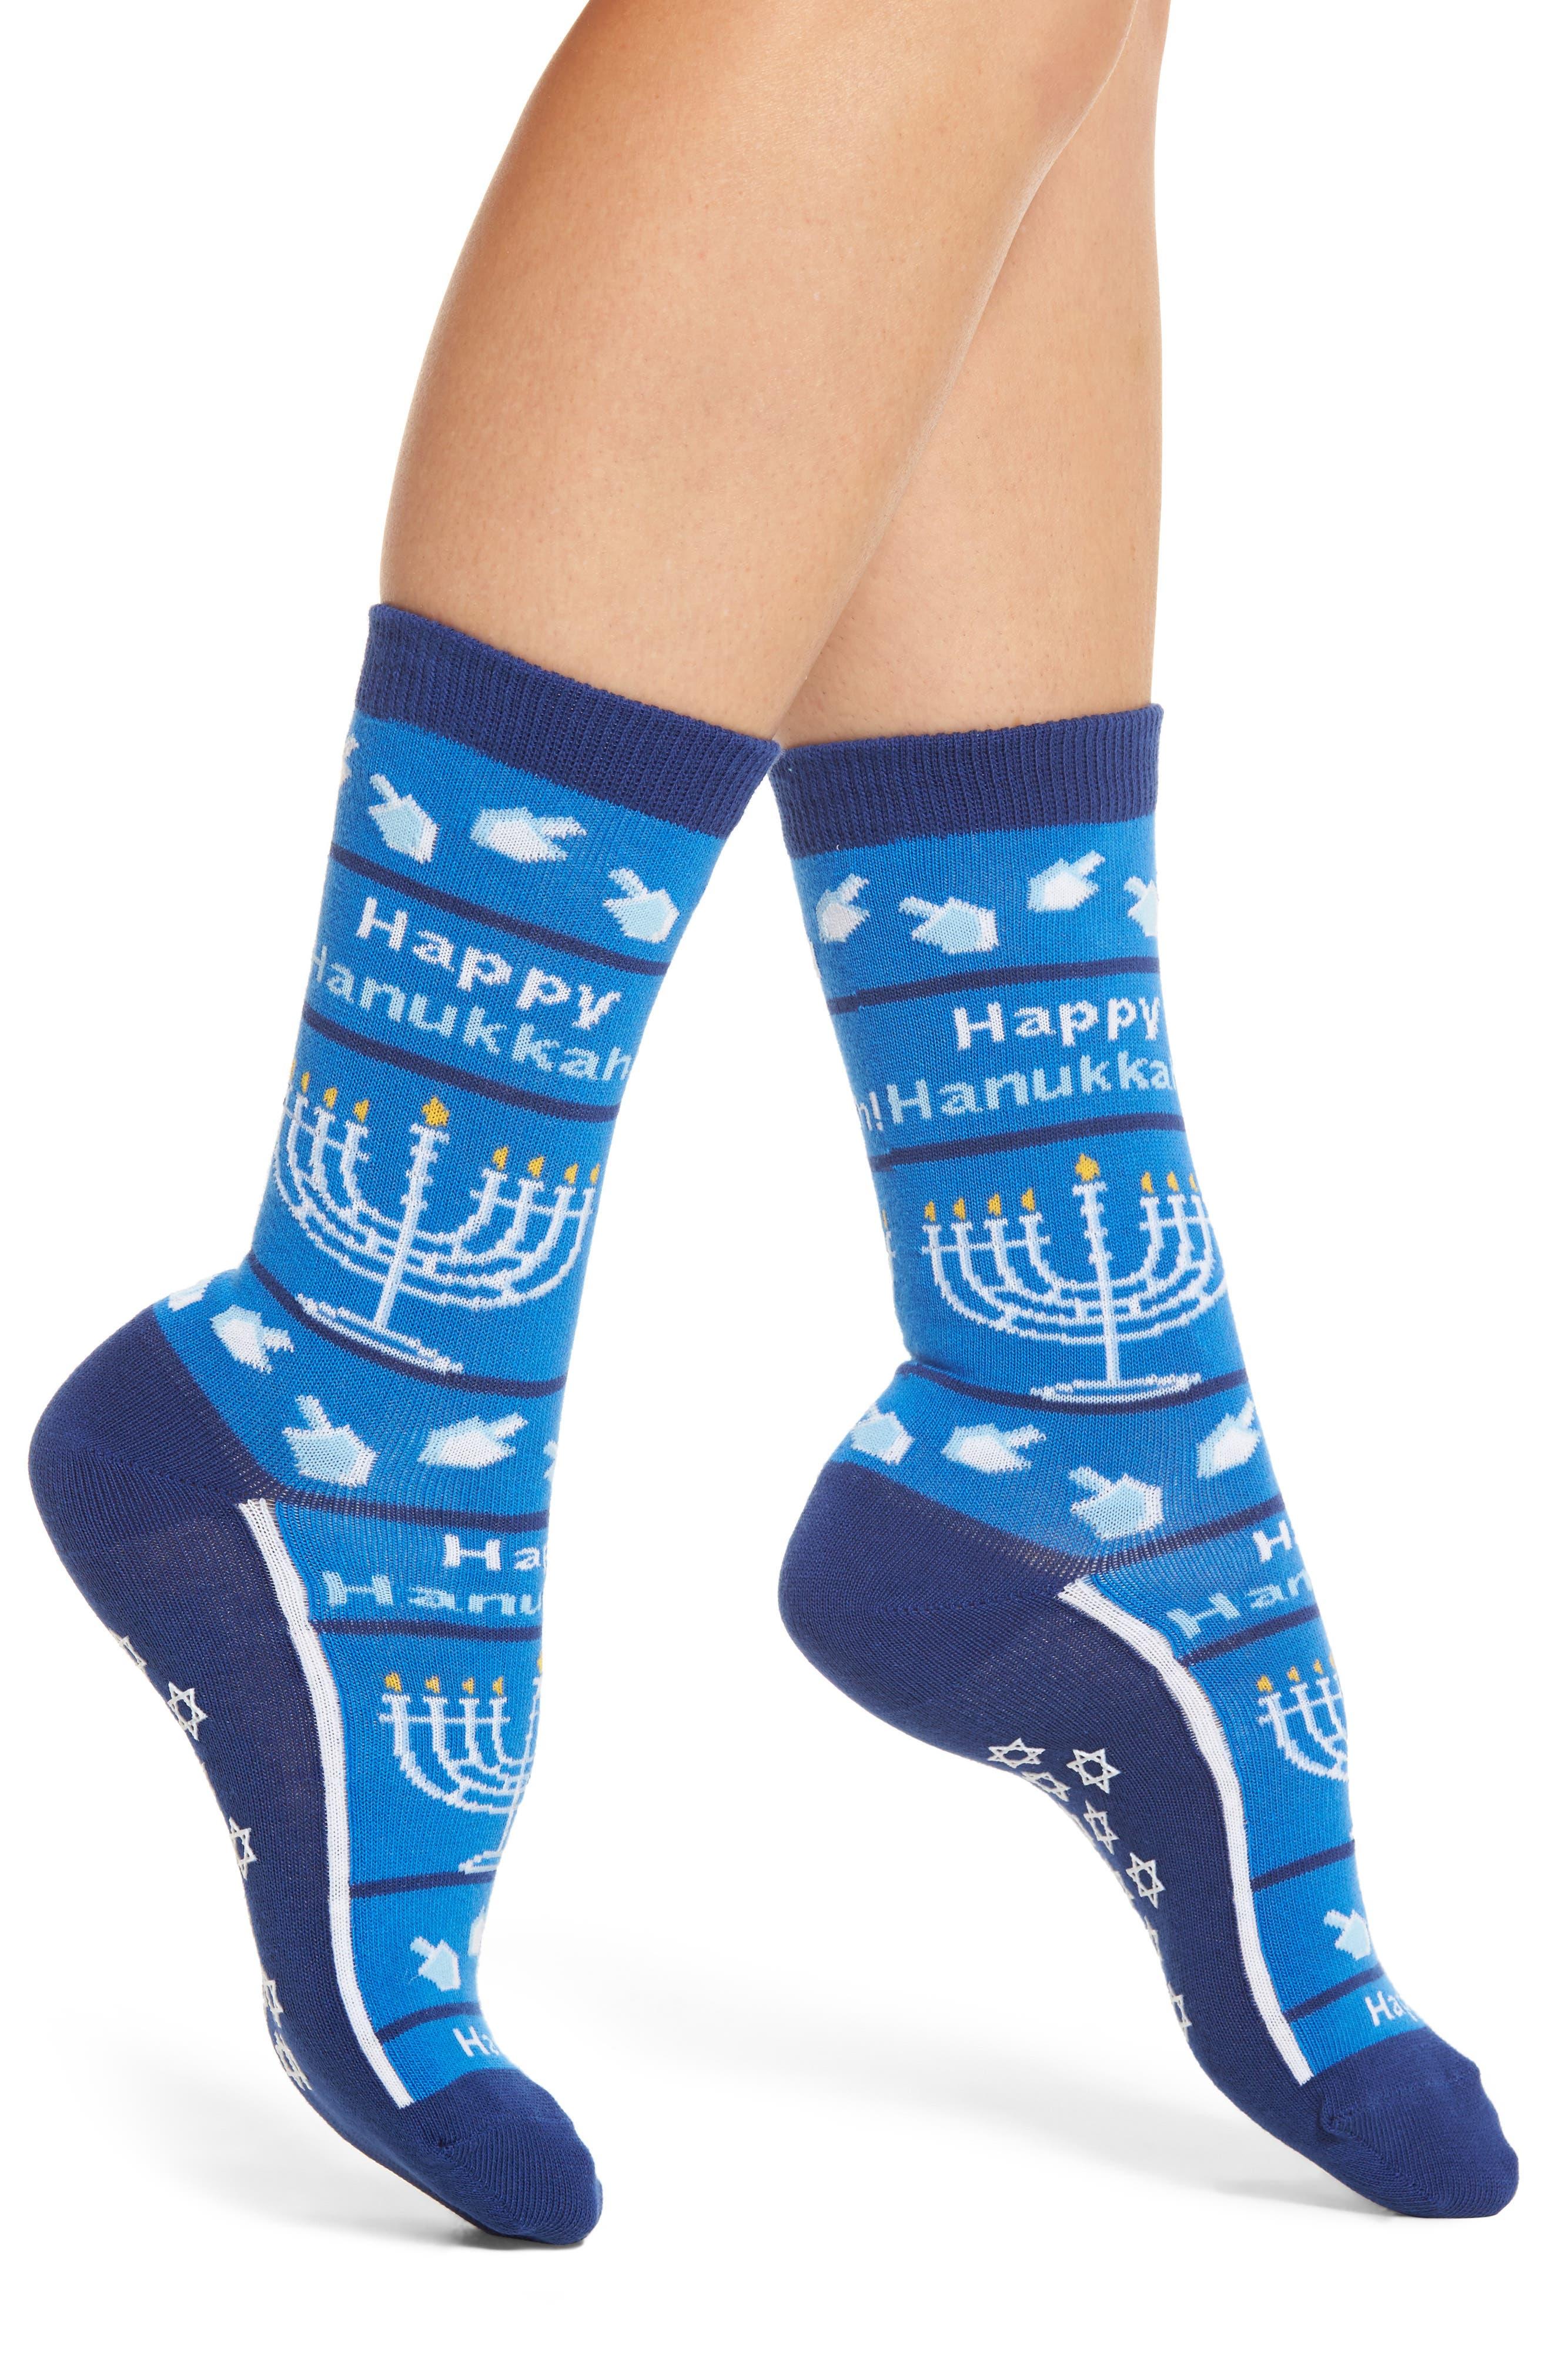 Hot Sox Happy Hanukkah Nonskid Socks (3 for $15)